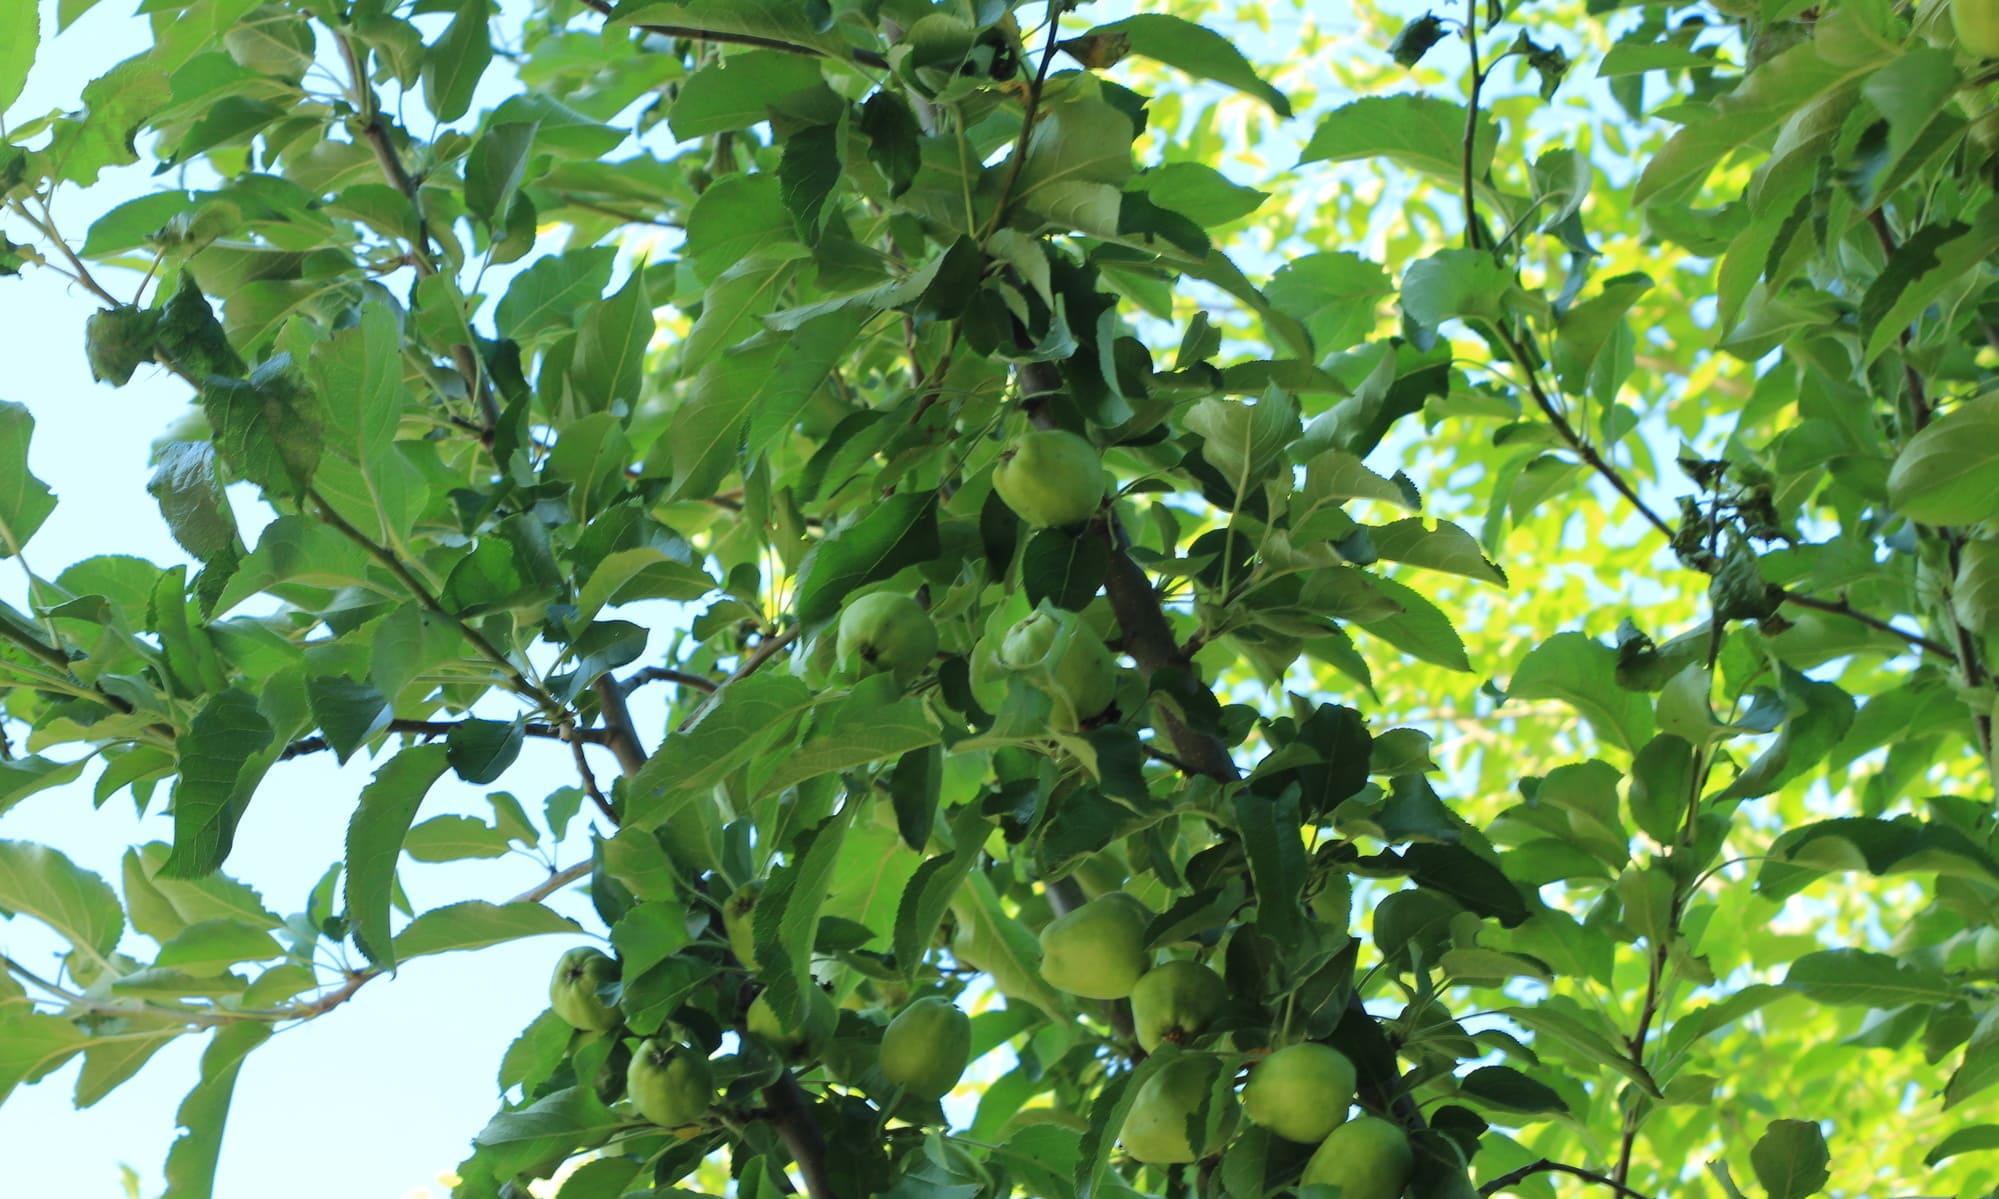 Manzano con fruta